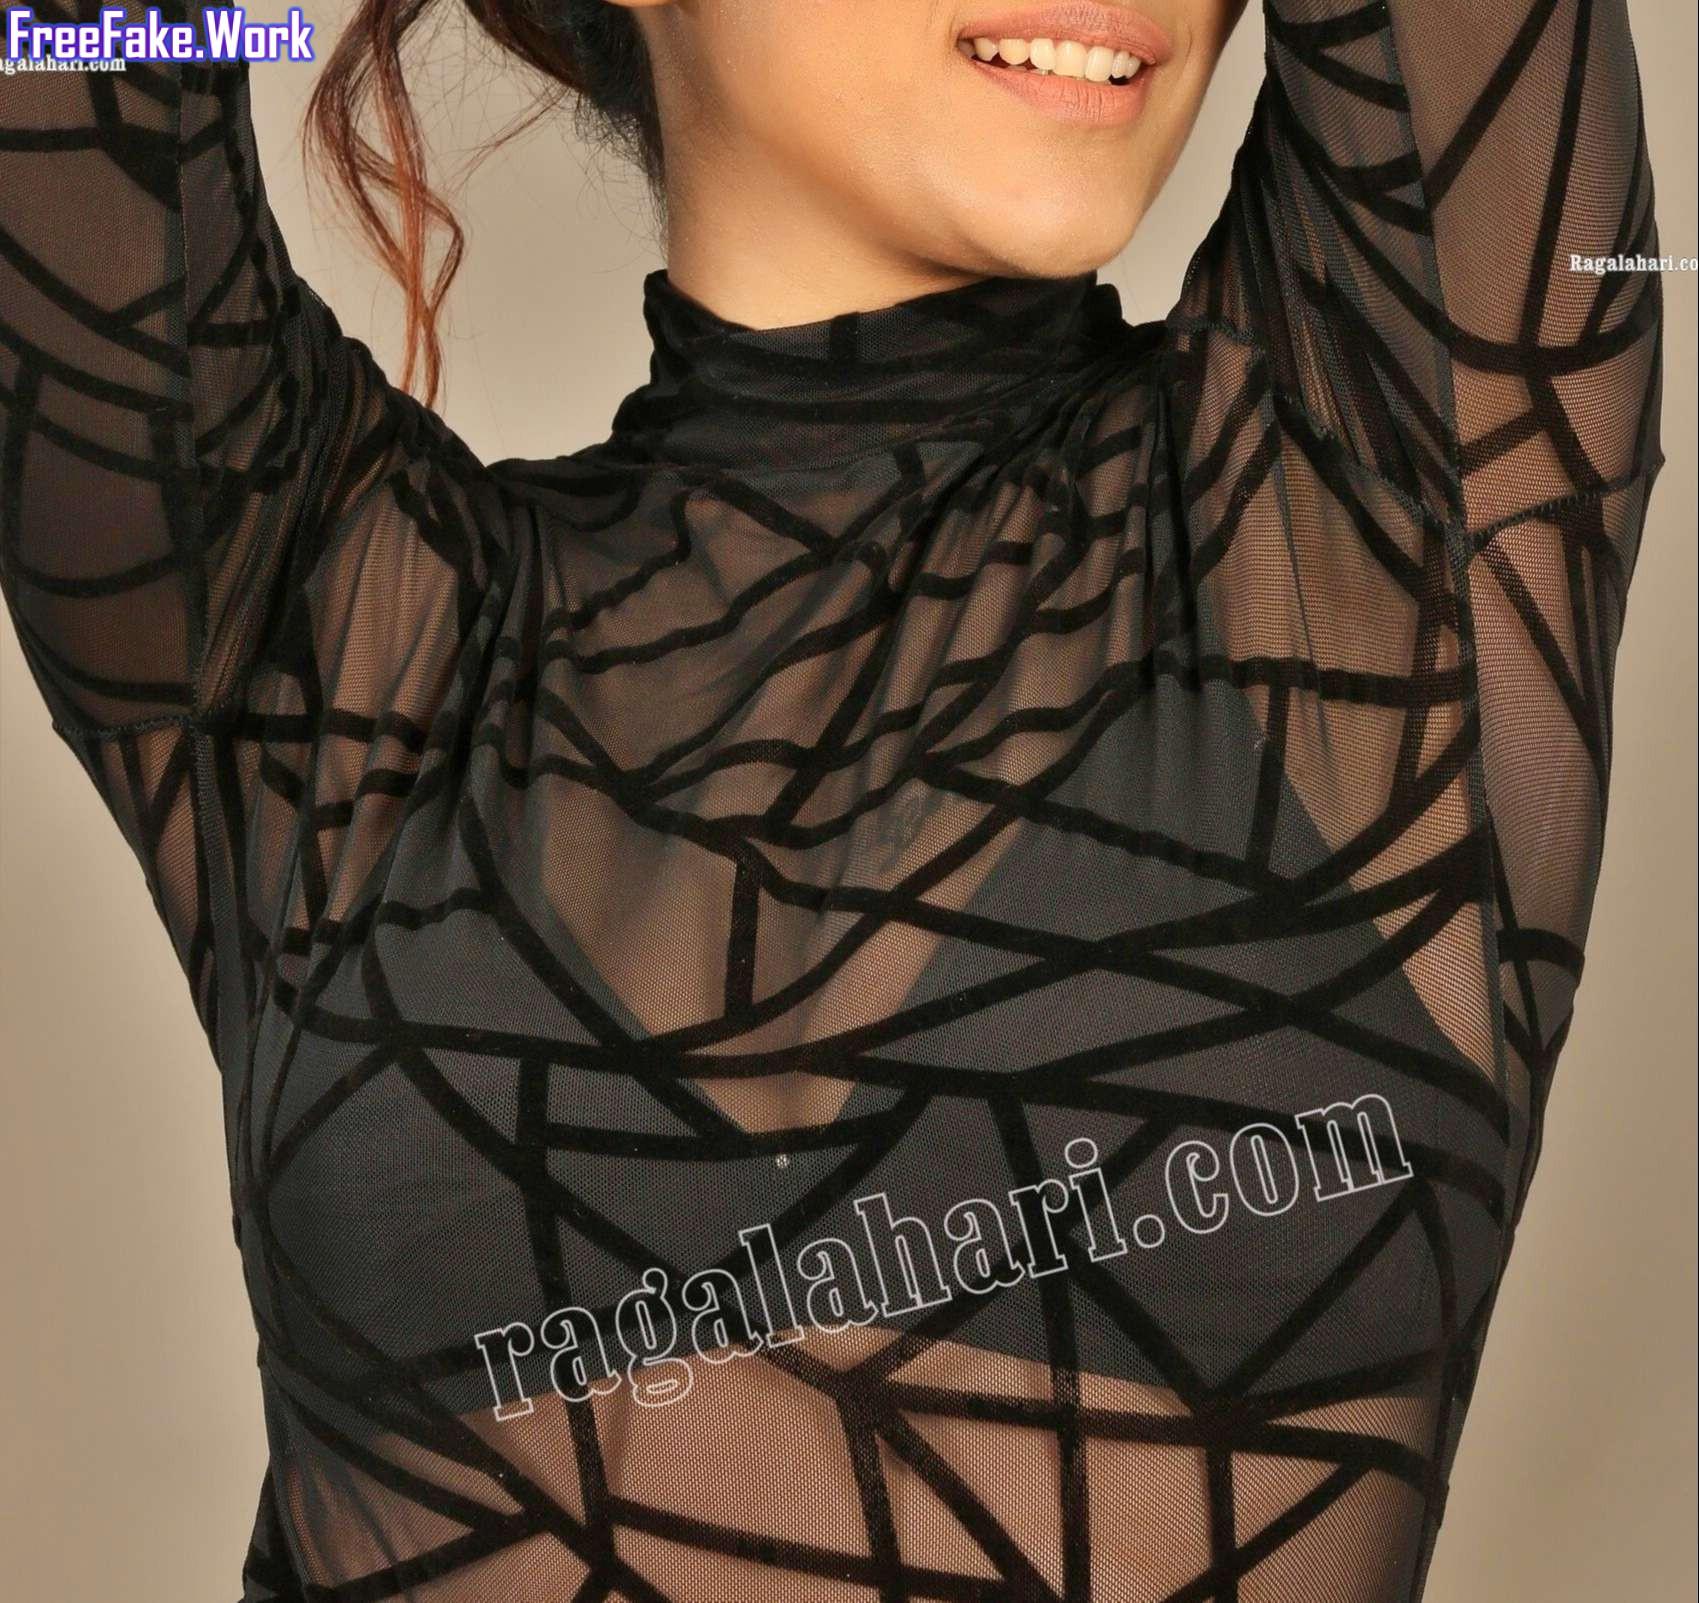 Hot-Supraja-Narayan-black-bra-close-up-see-through-top-2.jpg